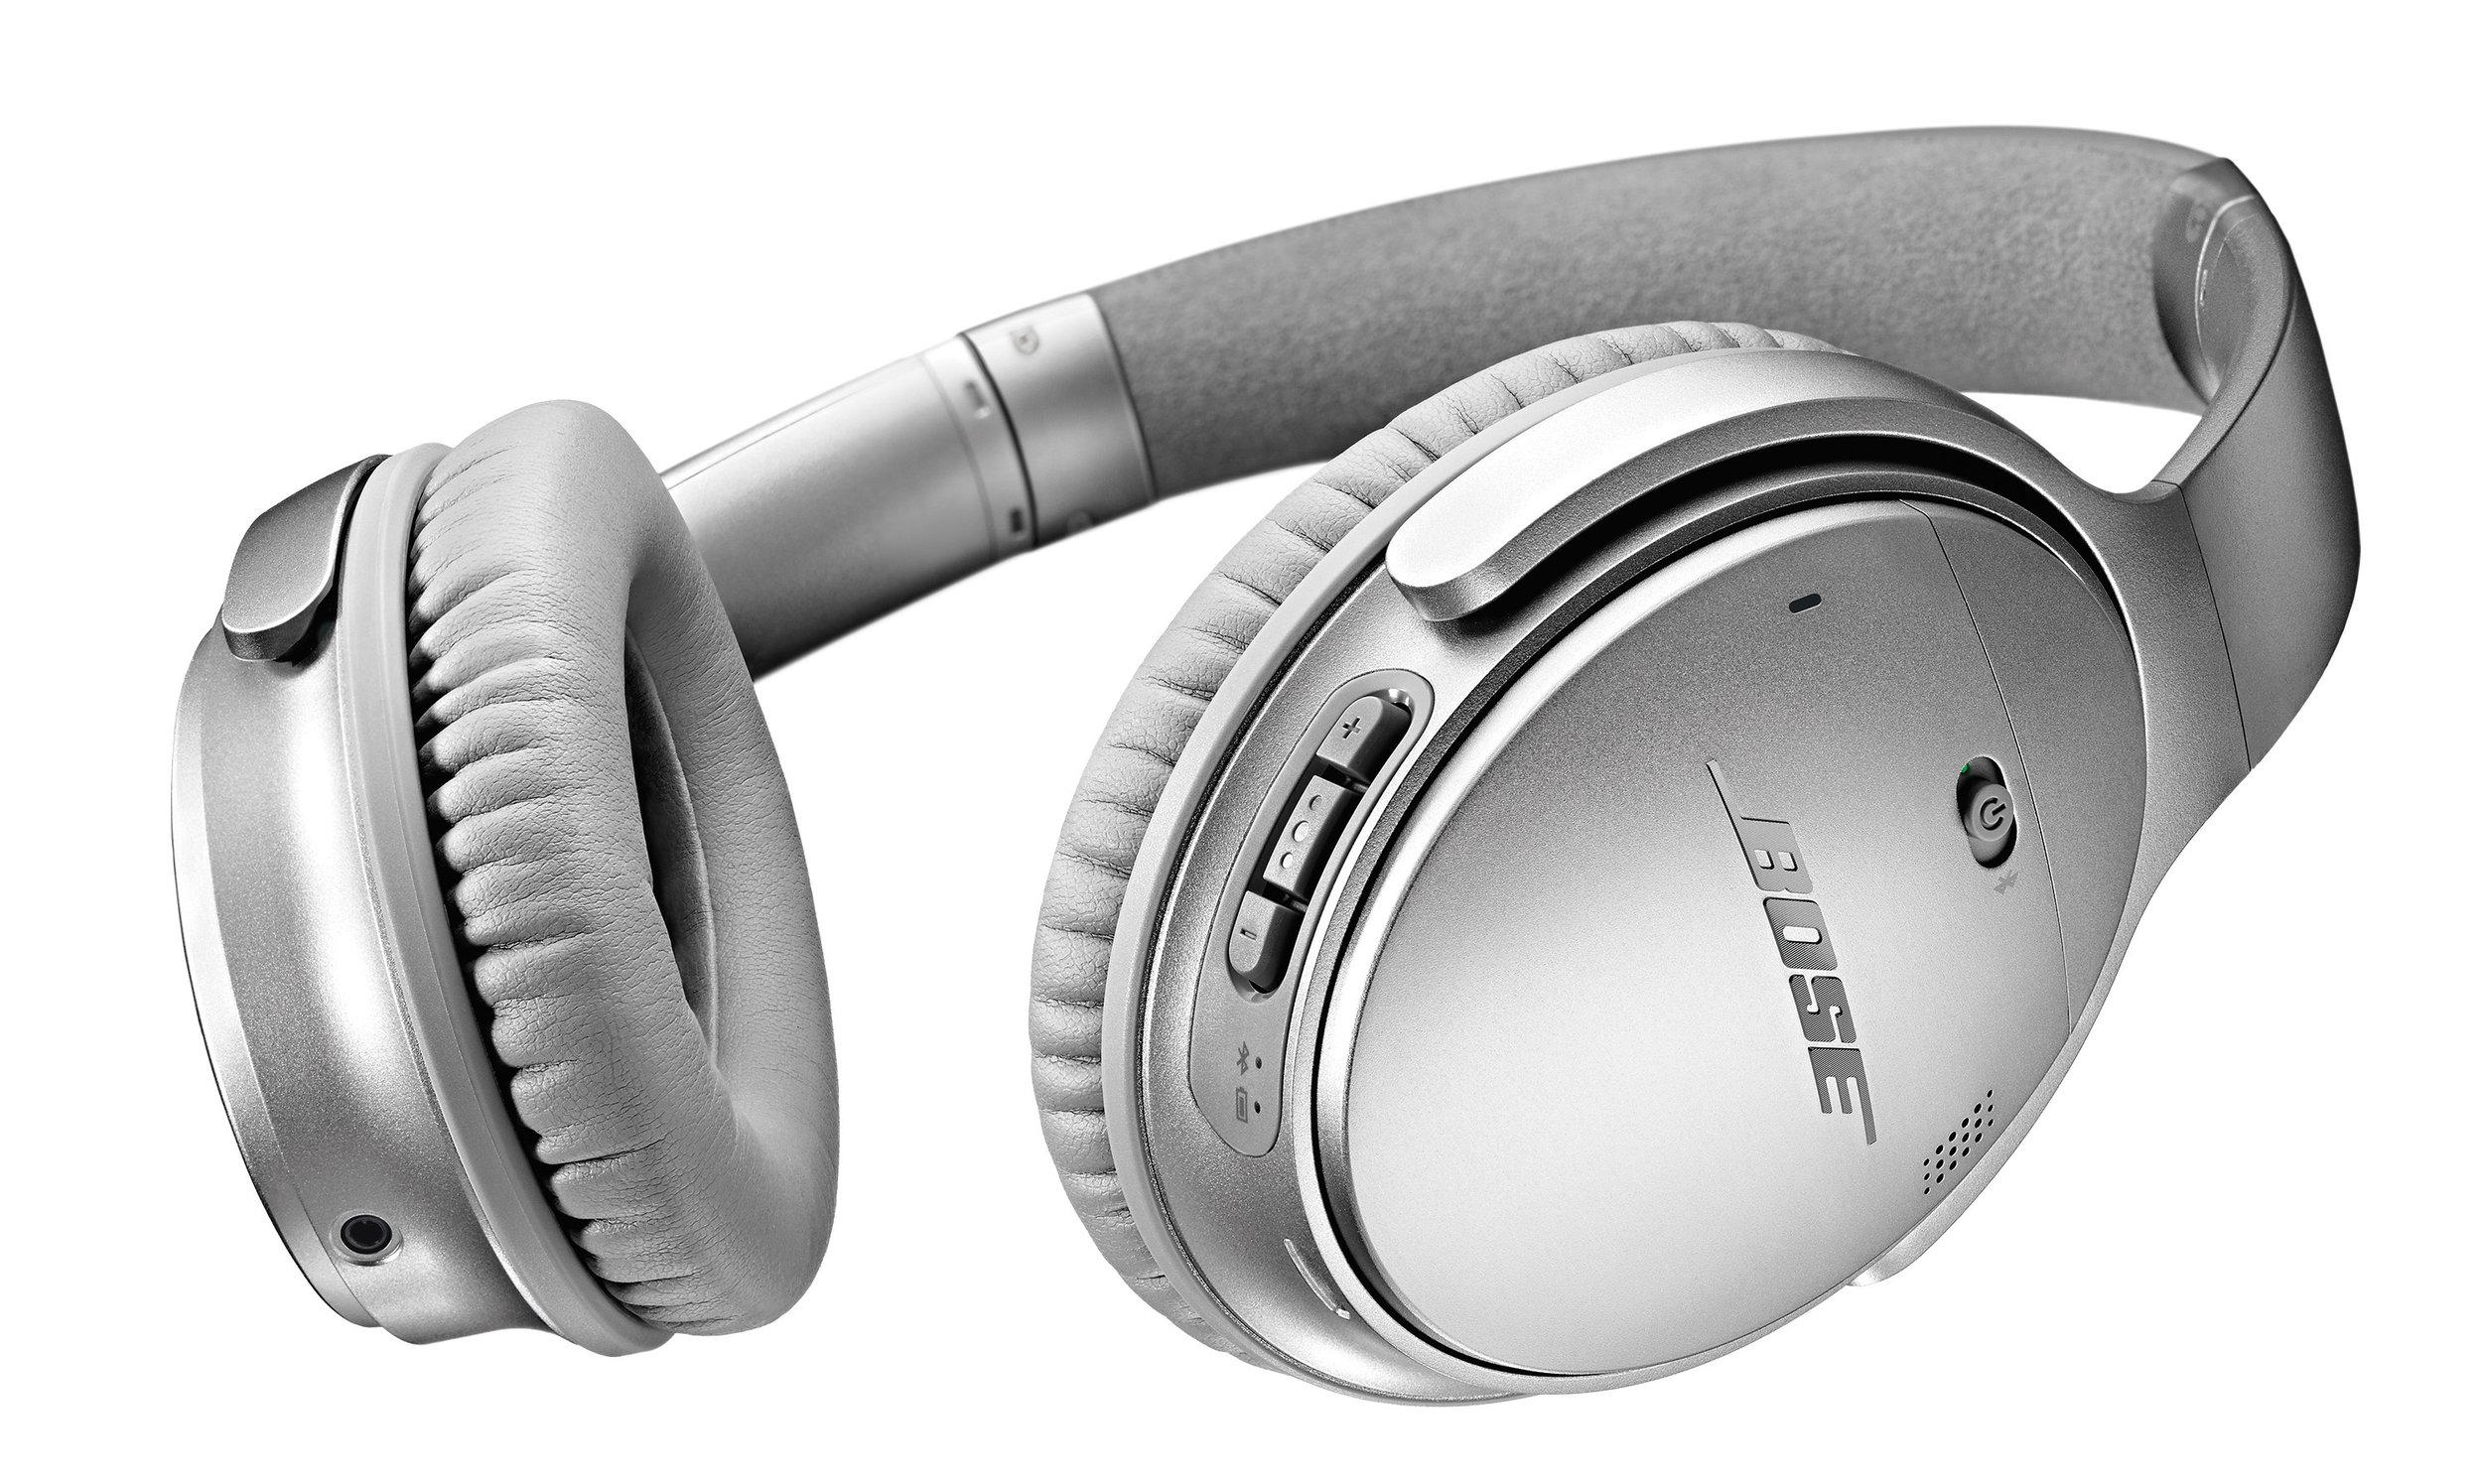 Bose QuietComfort 35 II - Industry-leading noise cancelling headphones